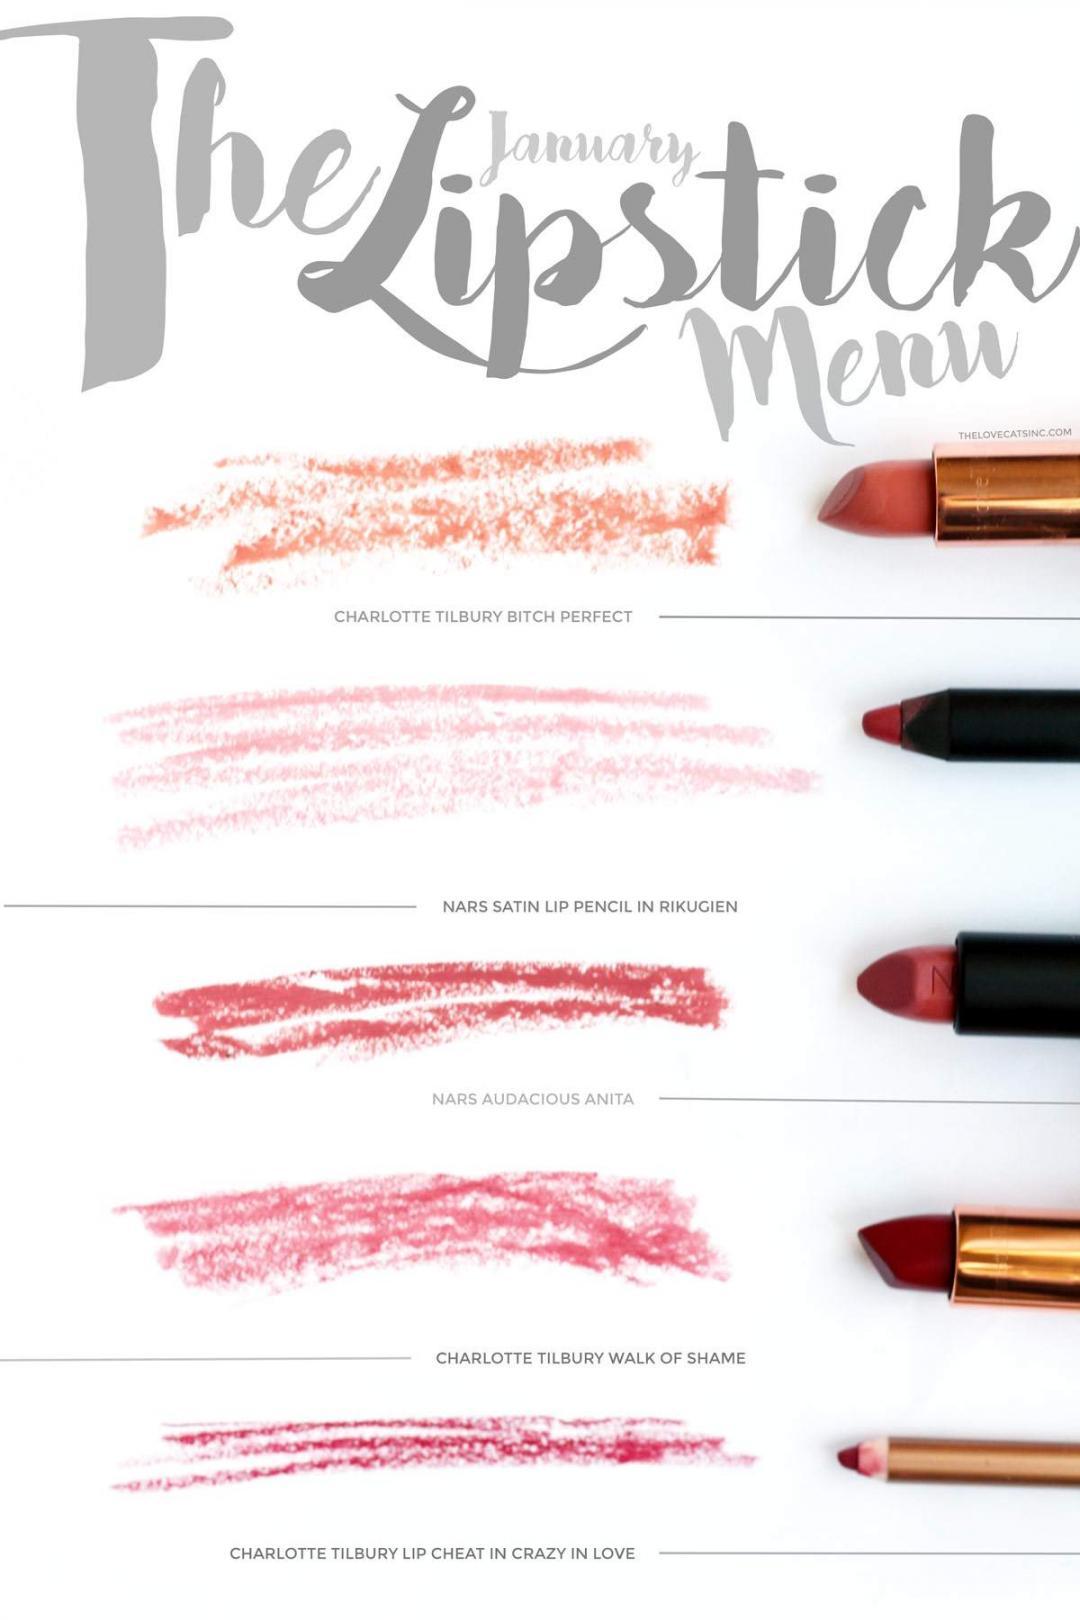 new-lipsticks-charlotte-tilbury-bitch-perfect-walk-of-shame-crazy-in-love-lip-cheat-NARS-audacious-anita-satin-lip-pencil-rikugien